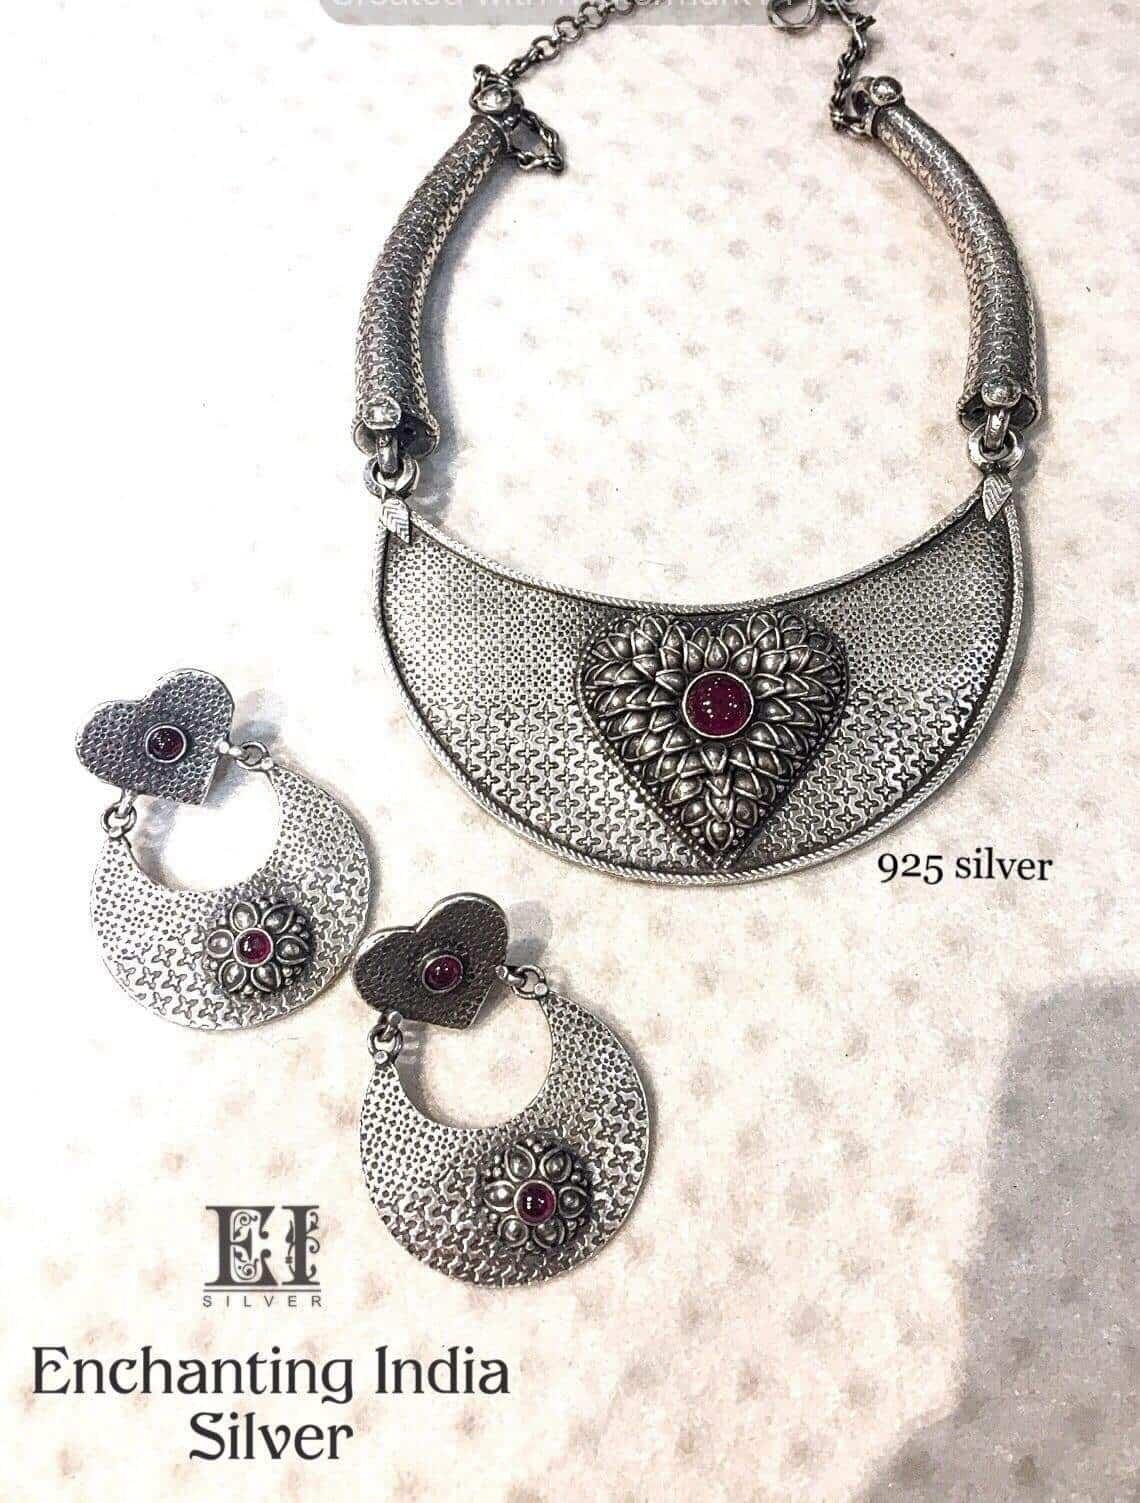 Enchanting India Silver- Ei Silver, Rajarampuri - Silver Jewellery ...